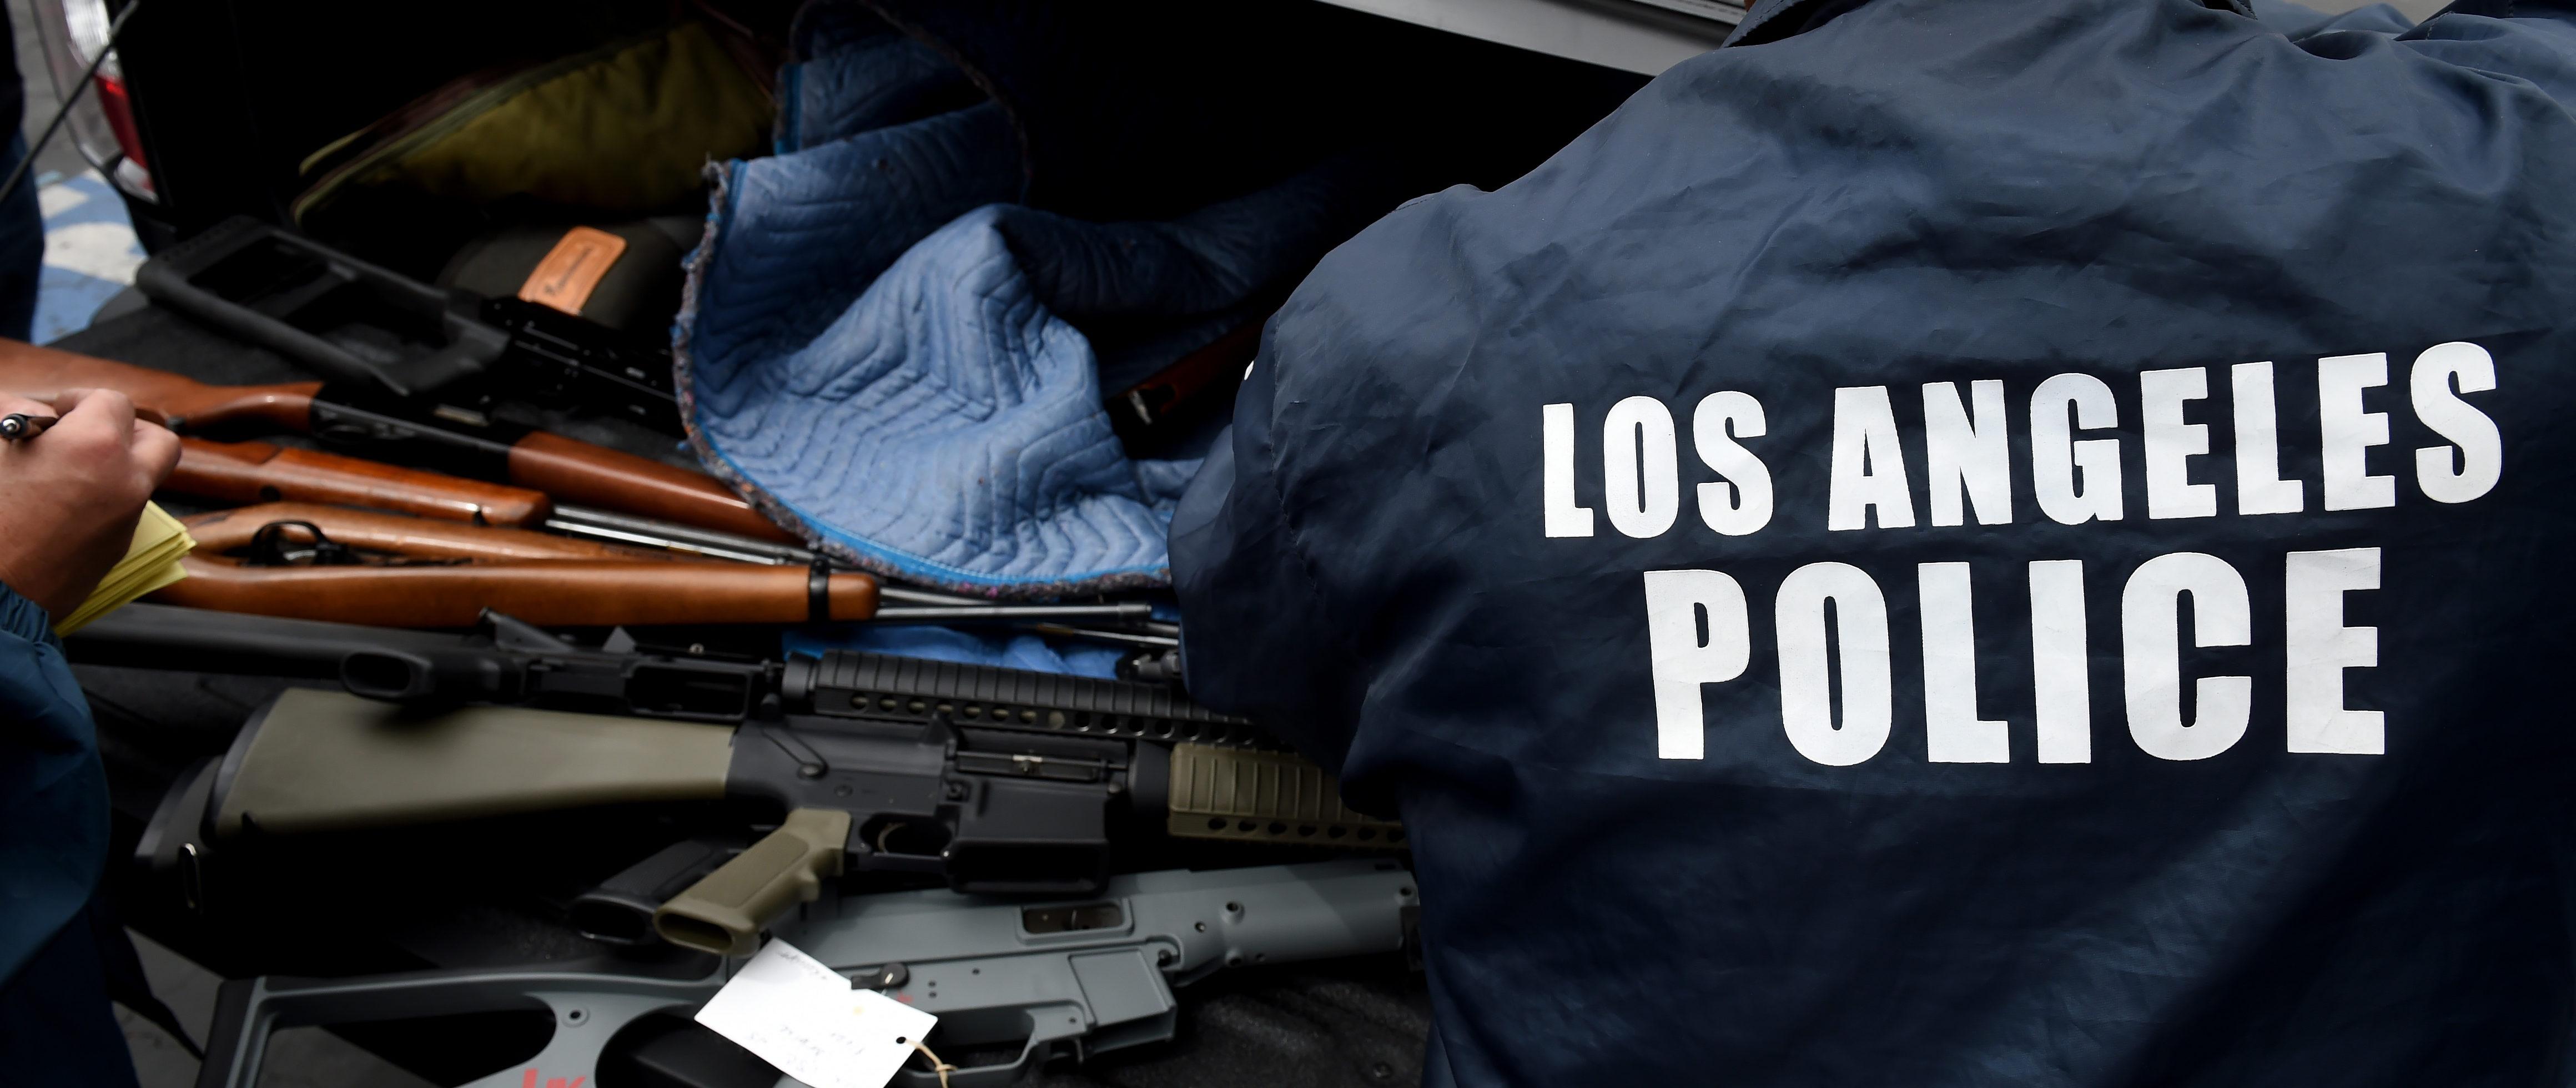 California Gun Law Prompts Frenzy Of Assault Gun